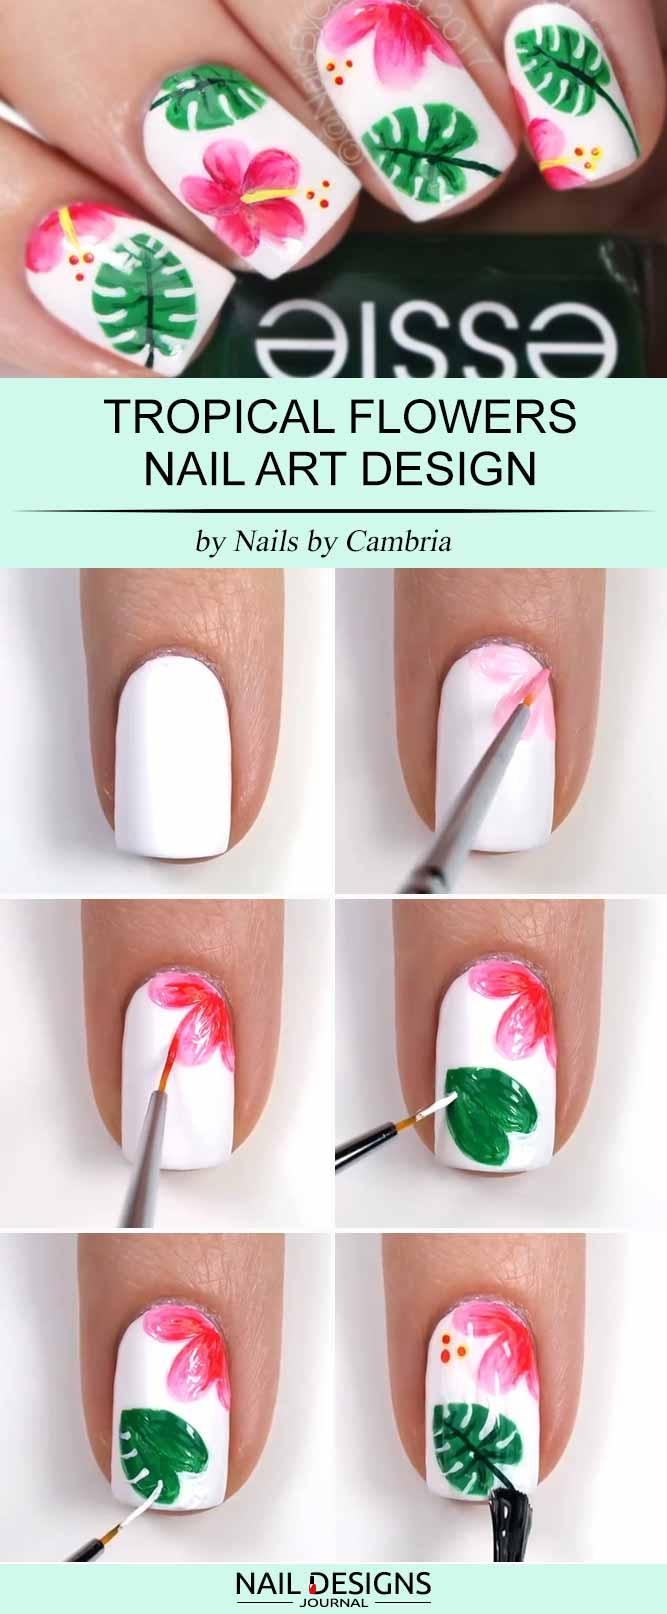 15 super easy nail designs diy tutorials crazyforus tropical flowers nail art prinsesfo Gallery